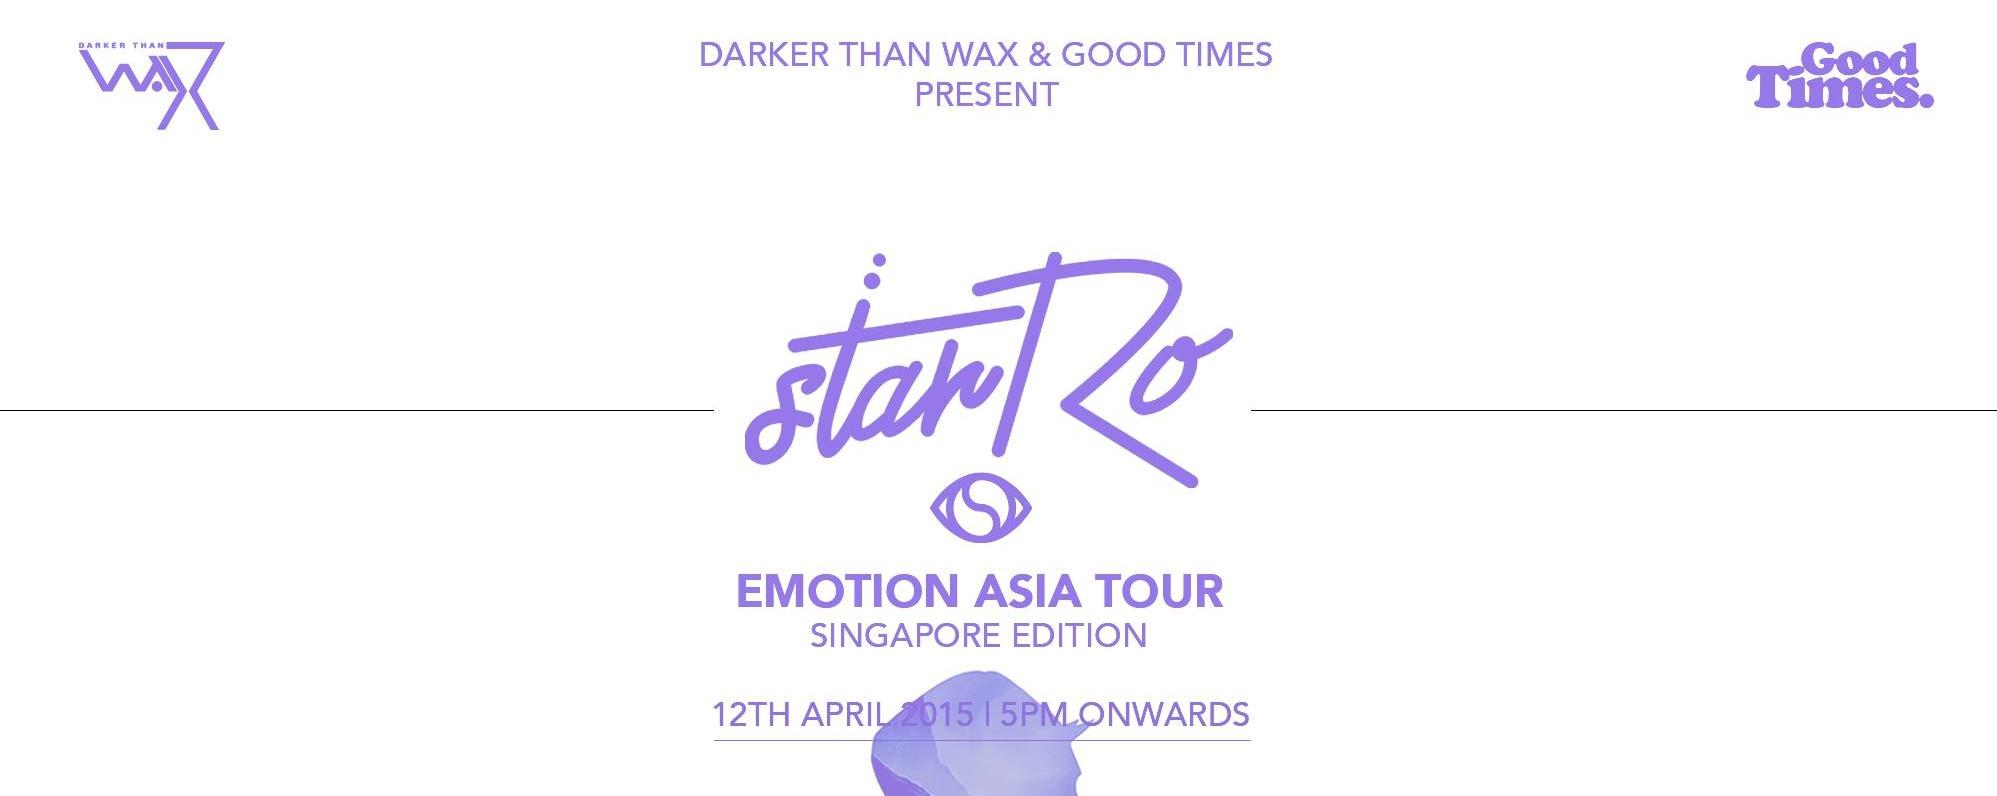 DTW & Good Times Present starRo